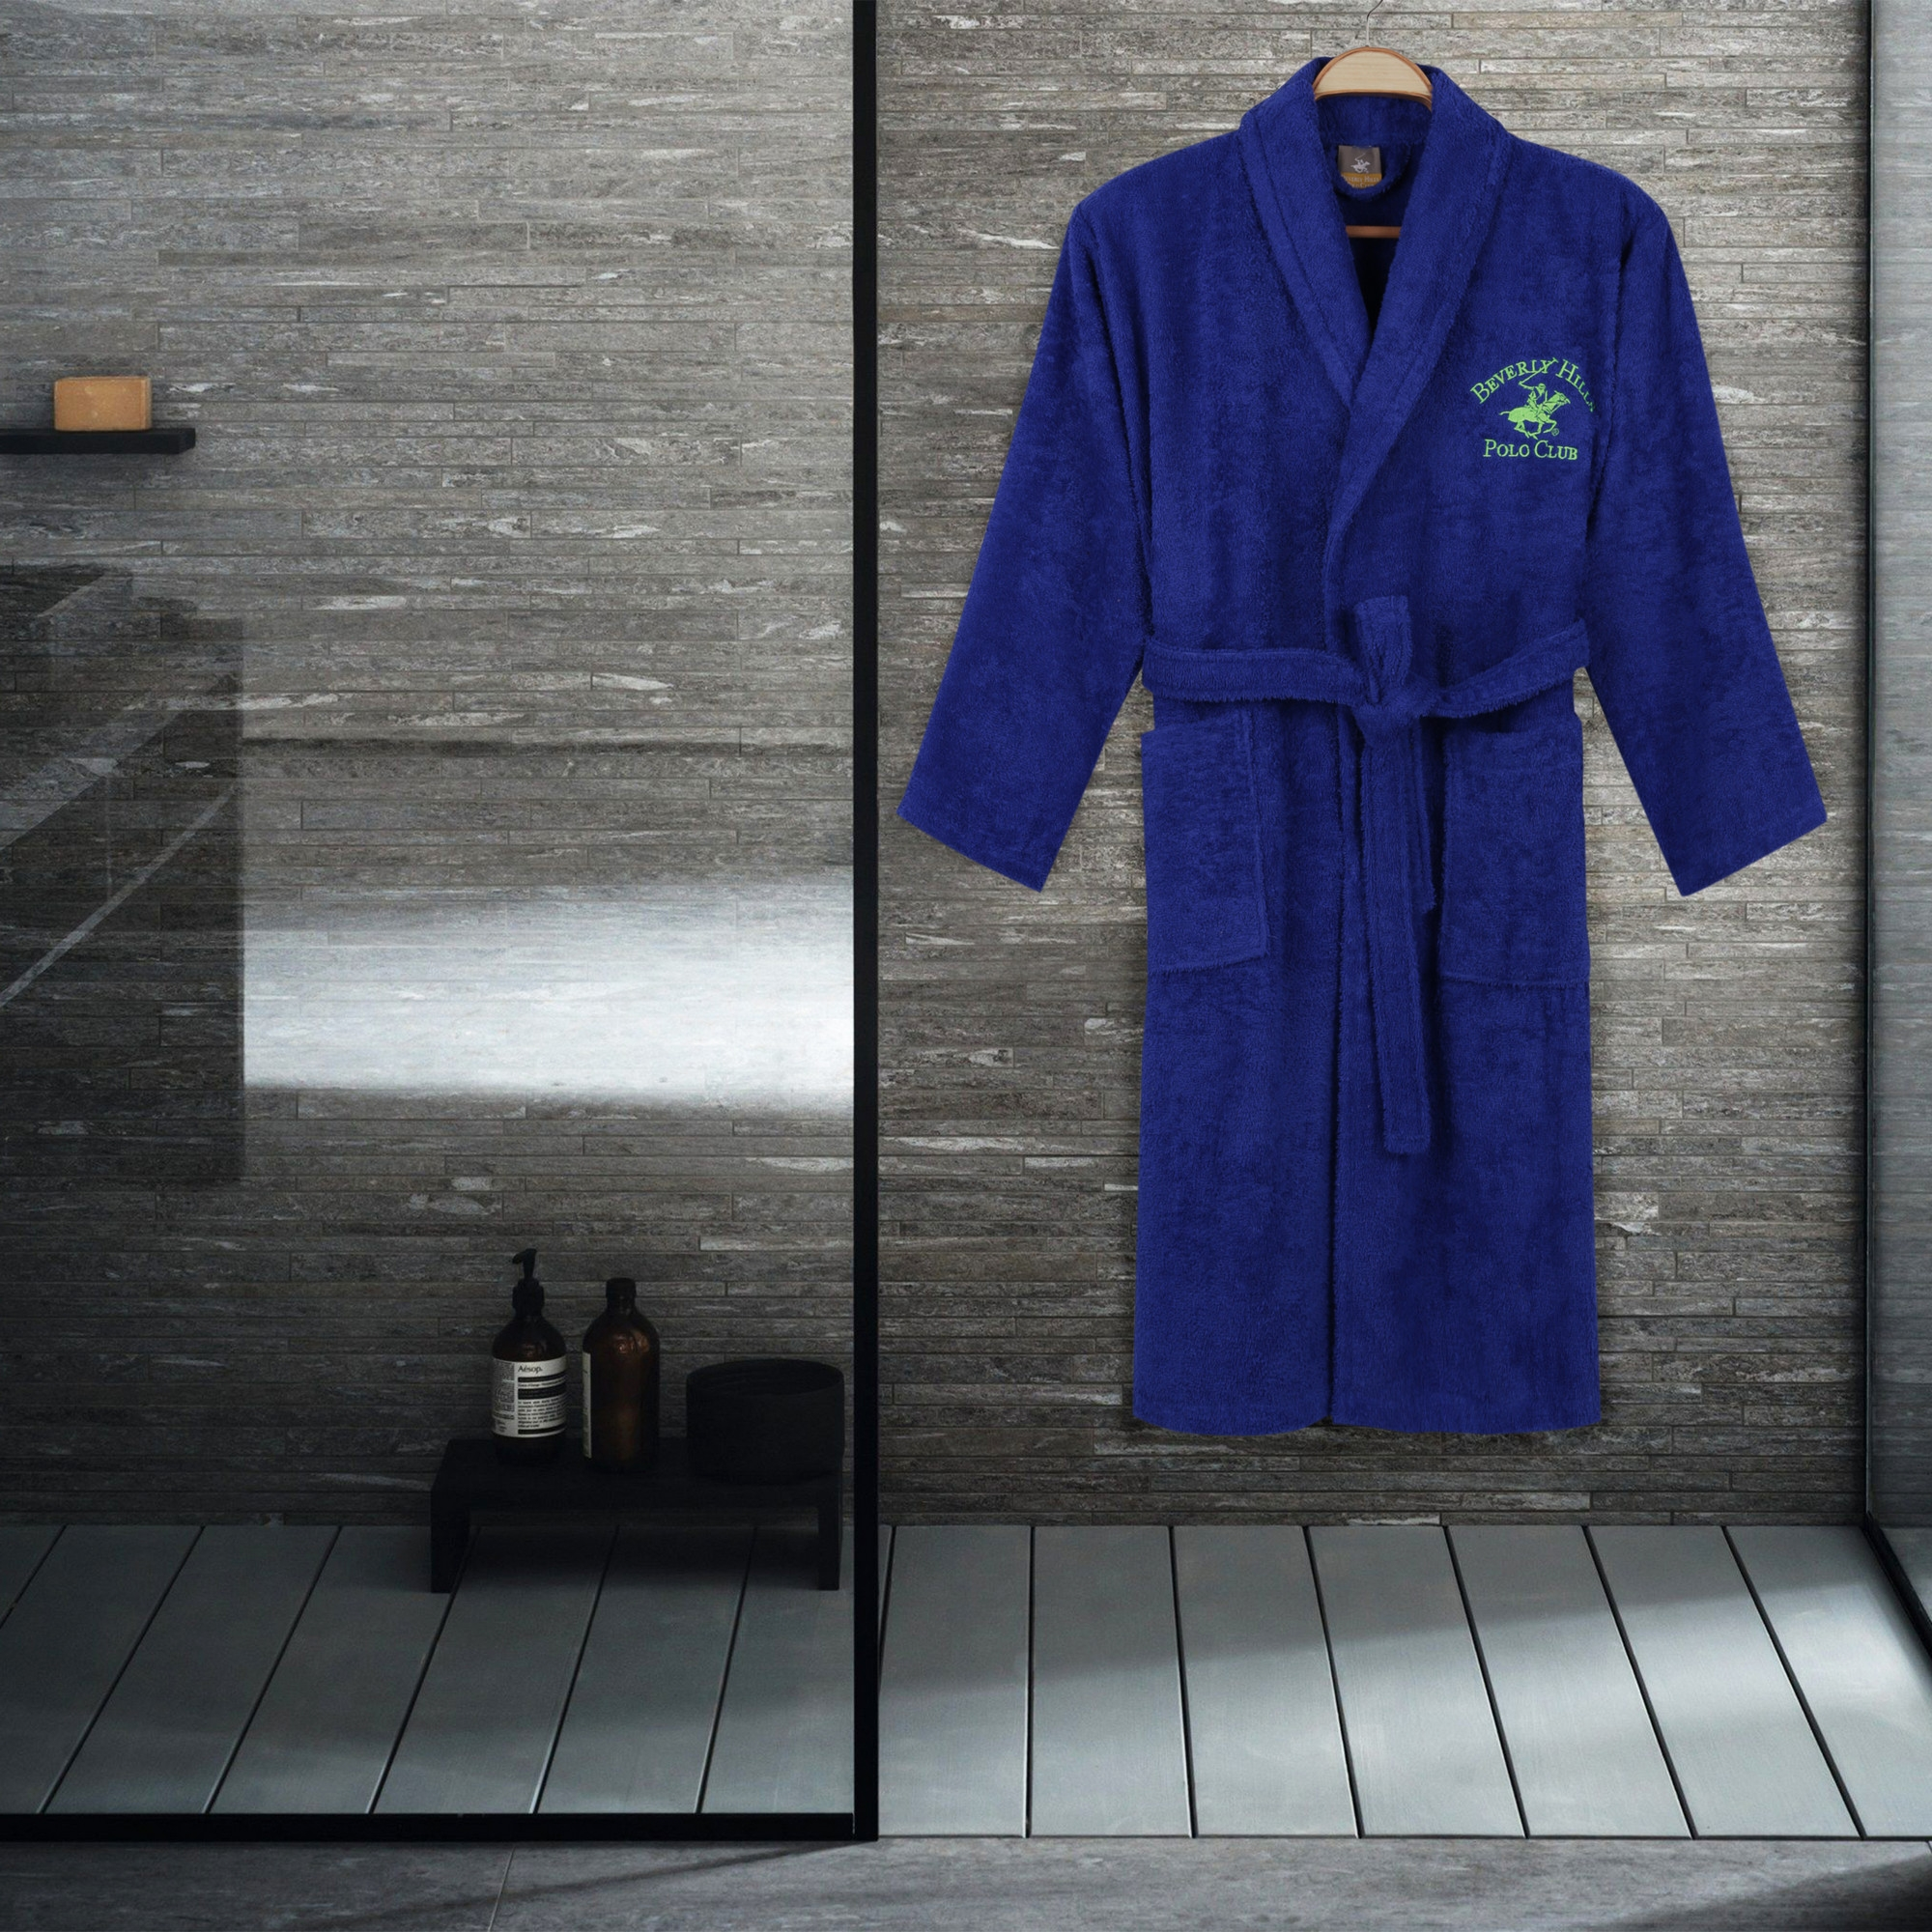 Halat de baie unisex, din bumbac, Beverly Hills Polo Club 700 Bleumarin, M / L